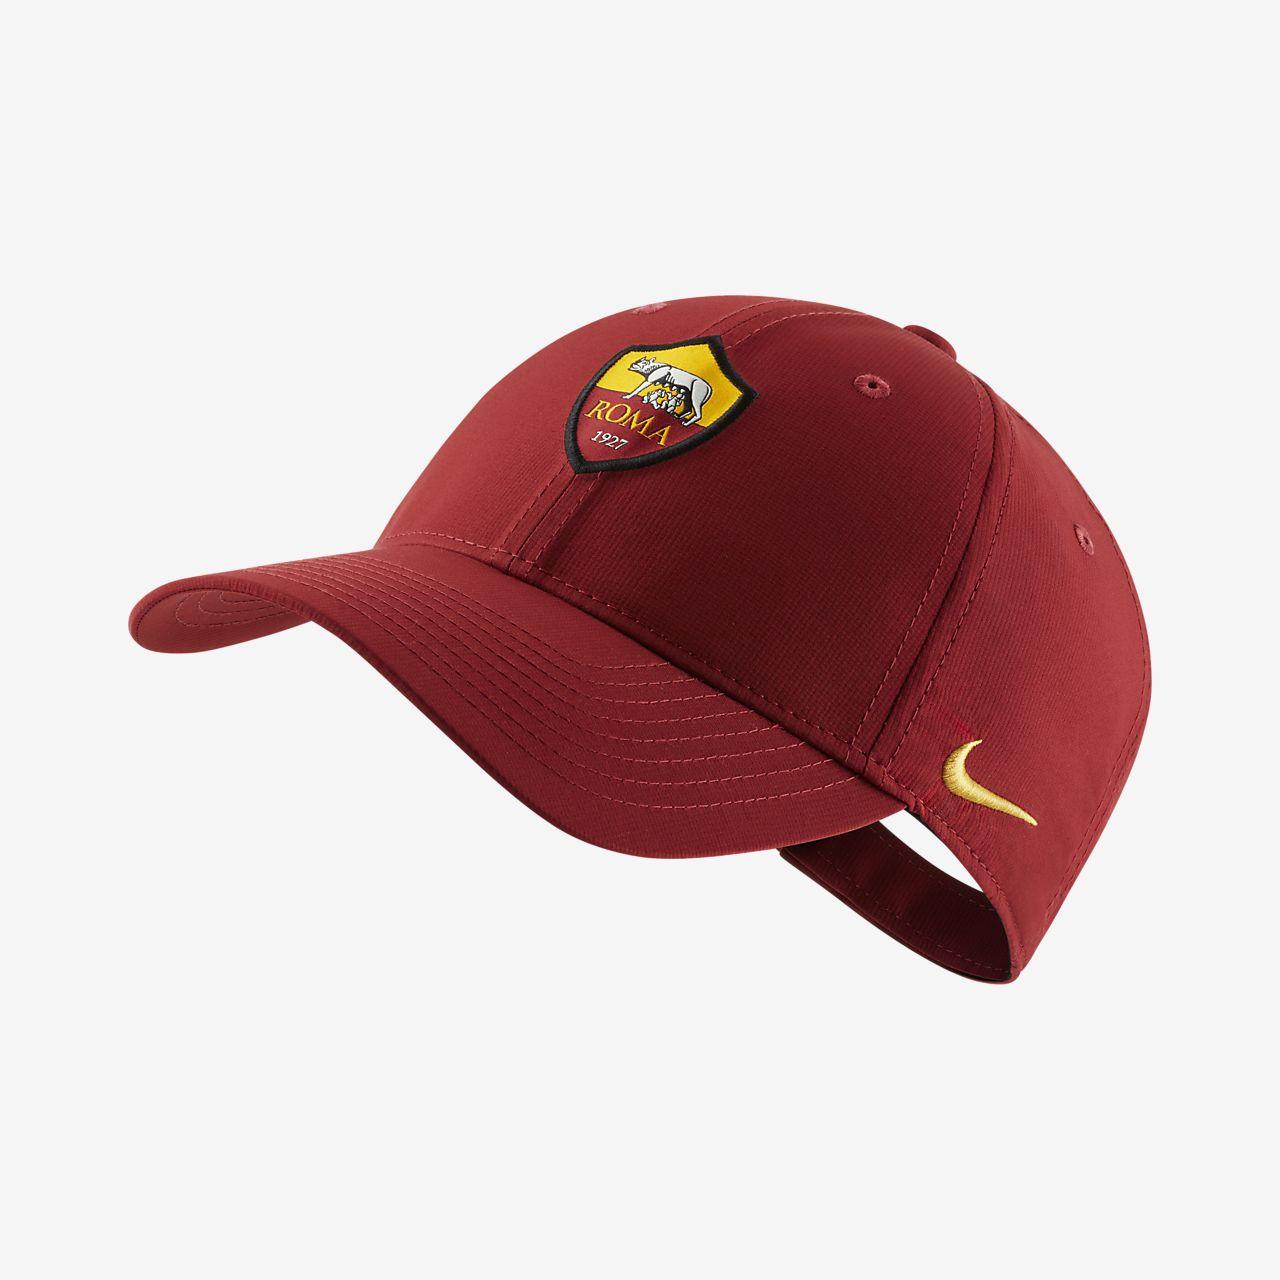 Casquette réglable Nike Dri-FIT A.S. Roma Legacy91